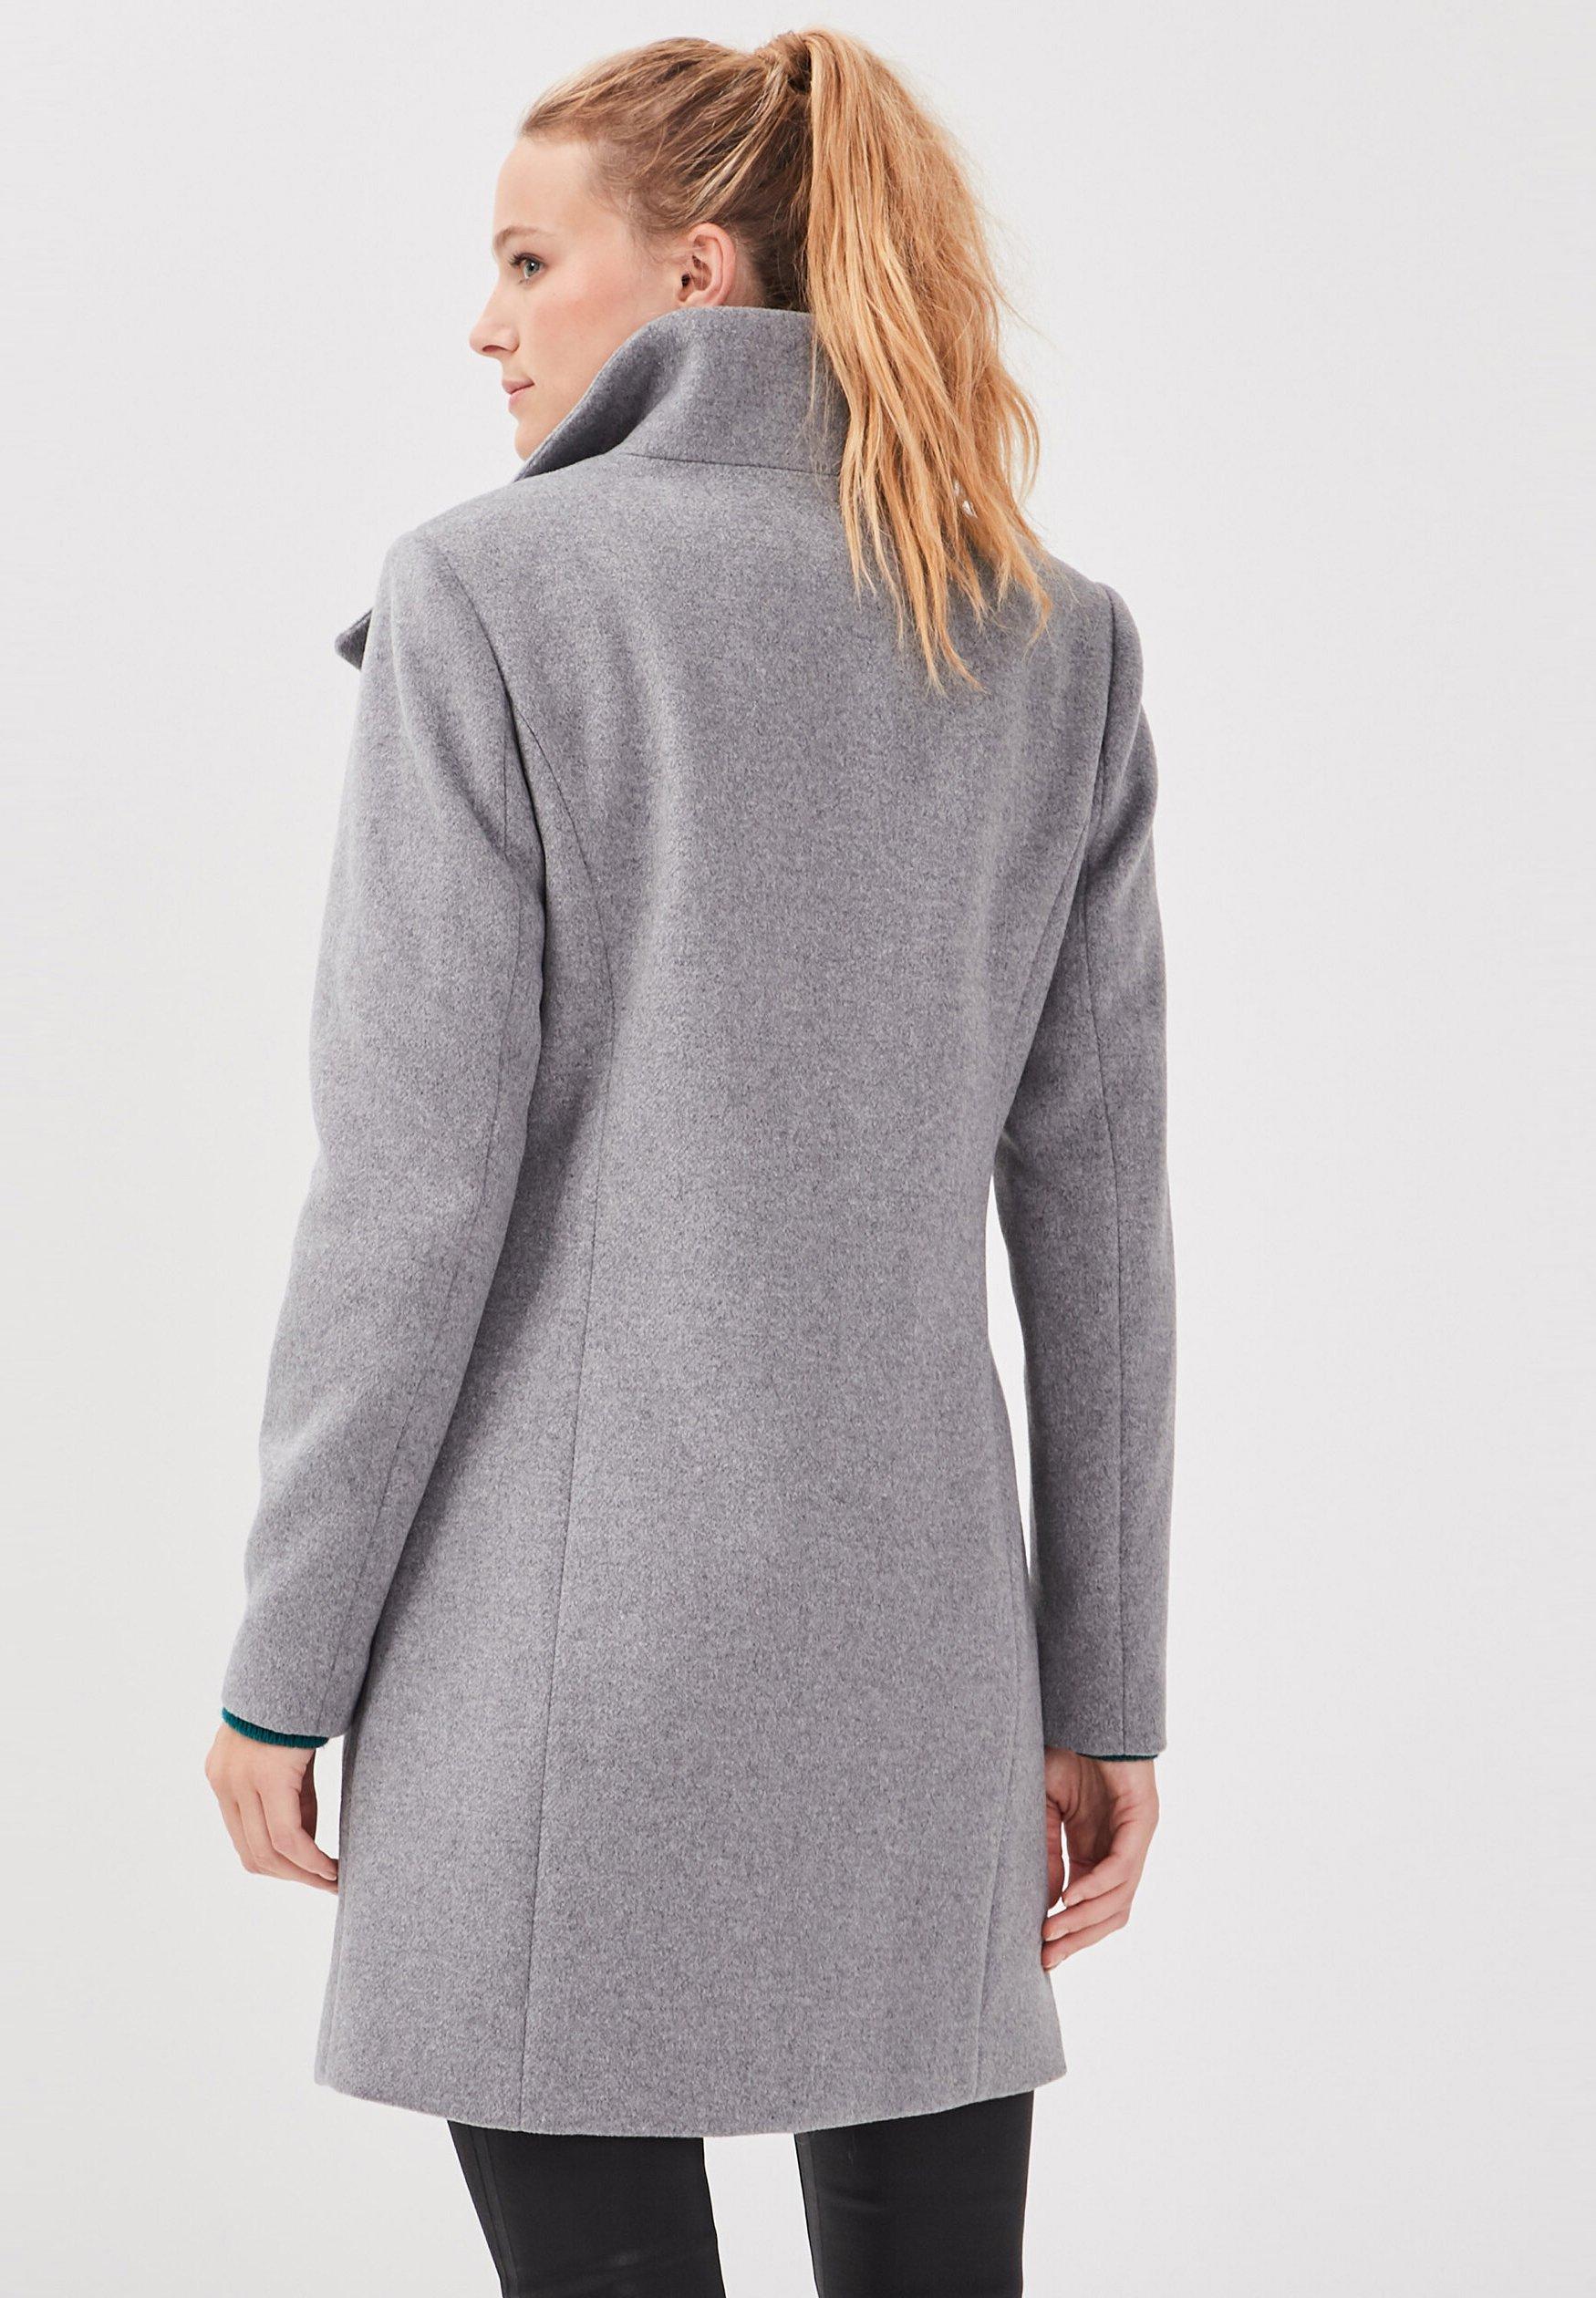 BONOBO Jeans Manteau classique gris ZALANDO.FR